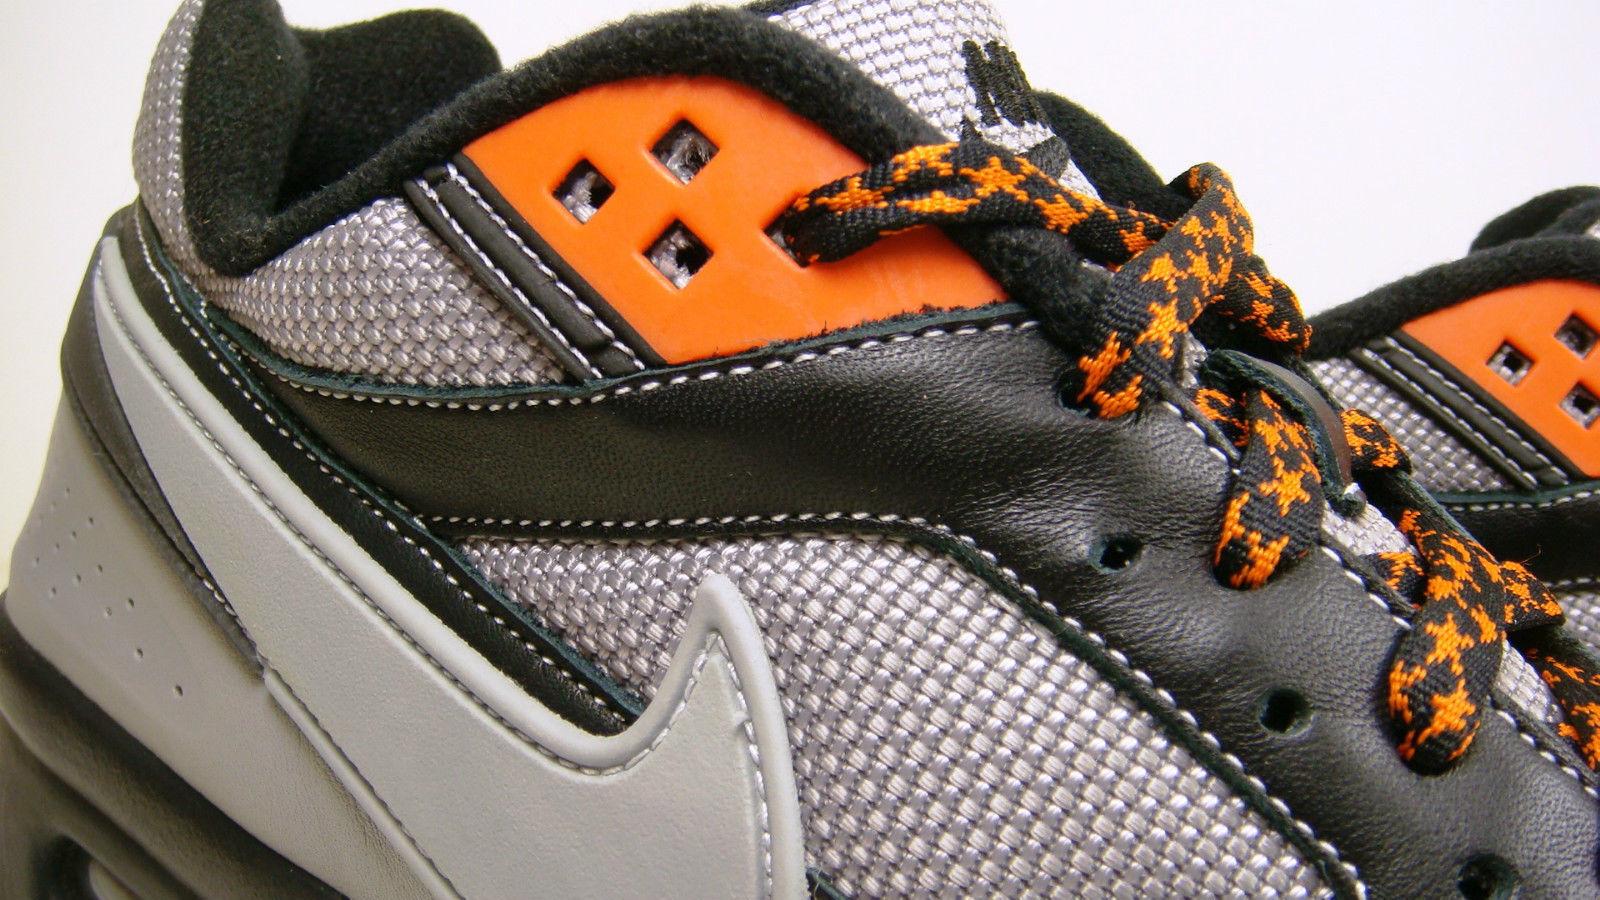 Nike nikelab zoom volare a new york york new york york city marathon bianco nero 10,5 ah5088 sz 001 46231f